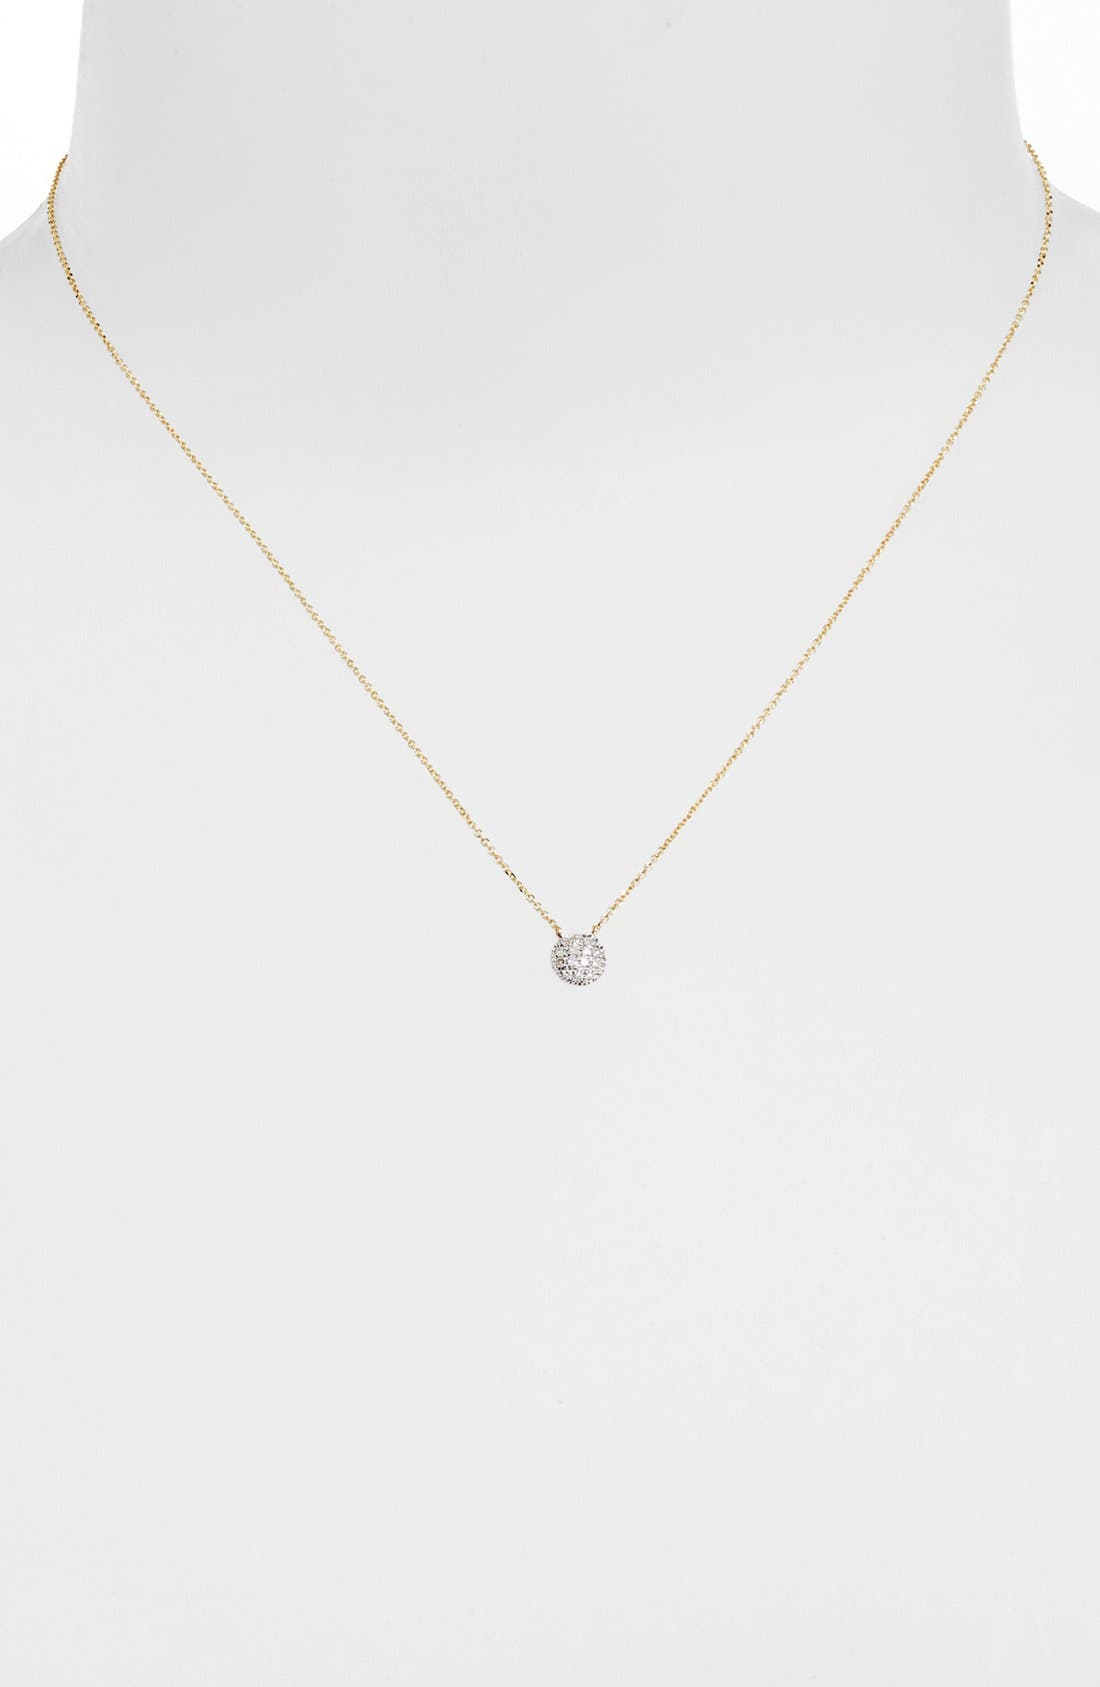 DANA REBECCA DESIGNS, 'Lauren Joy' Diamond Disc Pendant Necklace, Alternate thumbnail 7, color, YELLOW GOLD